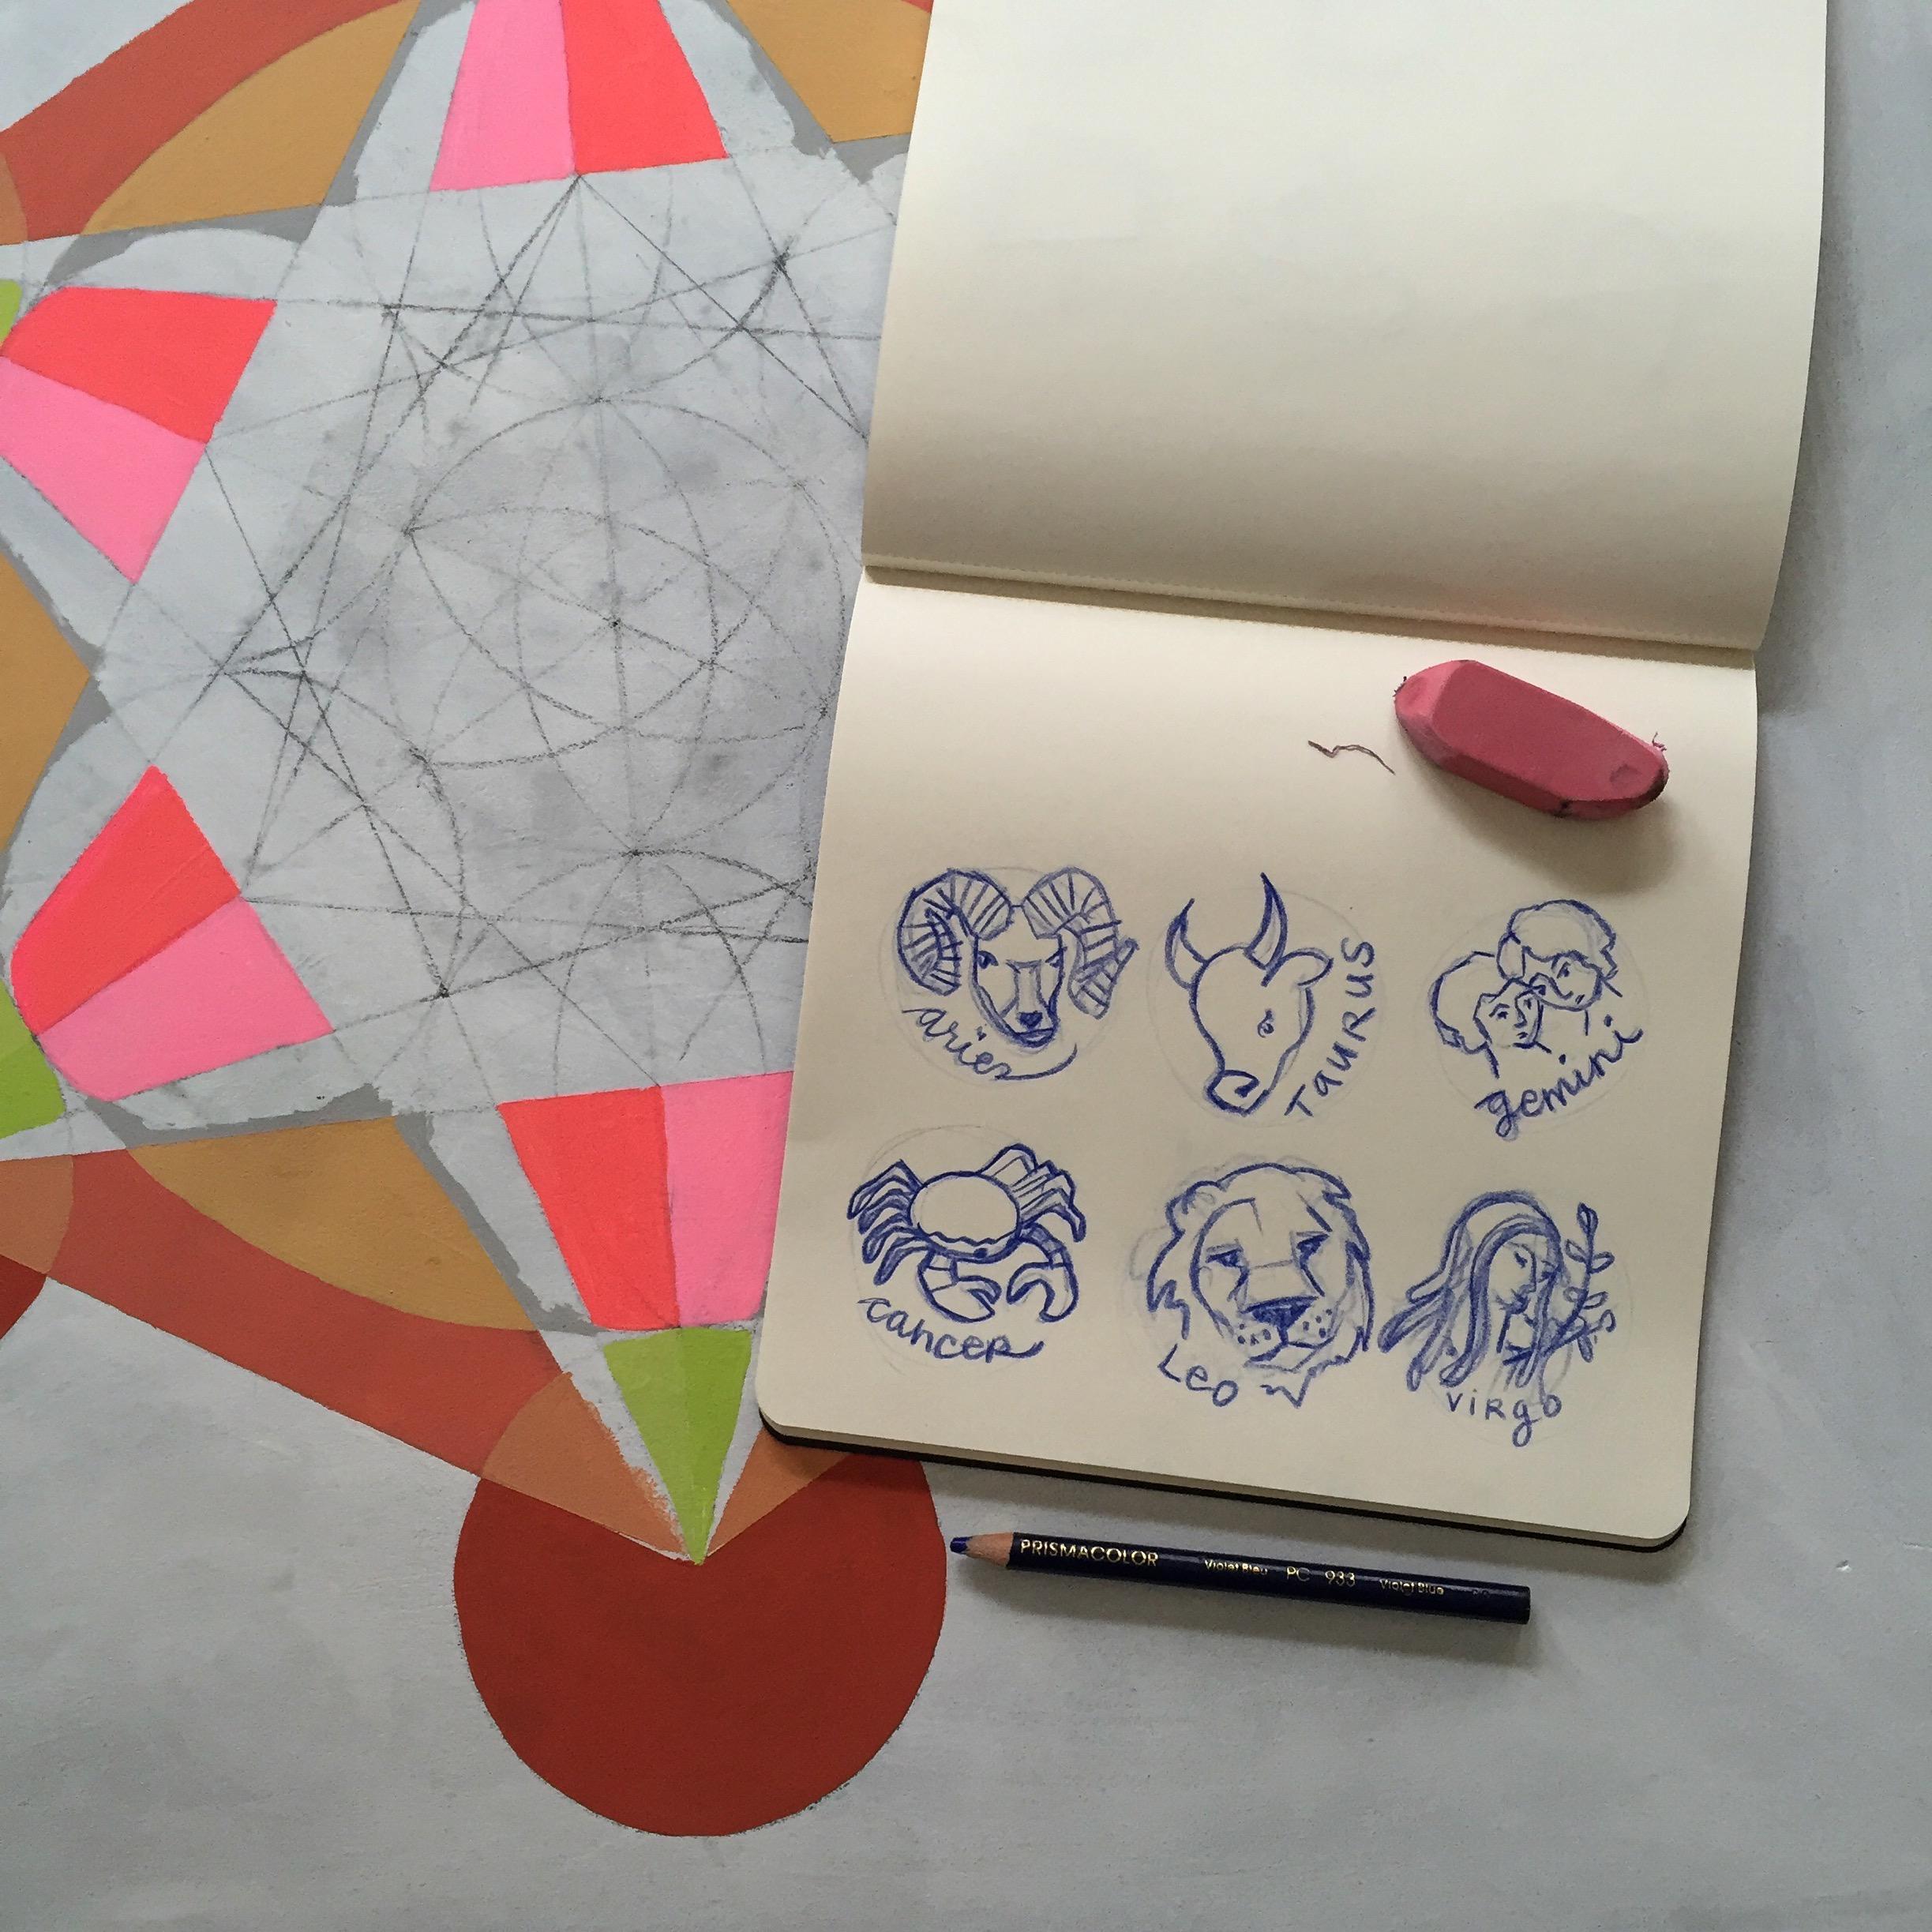 crystal moody | in progress